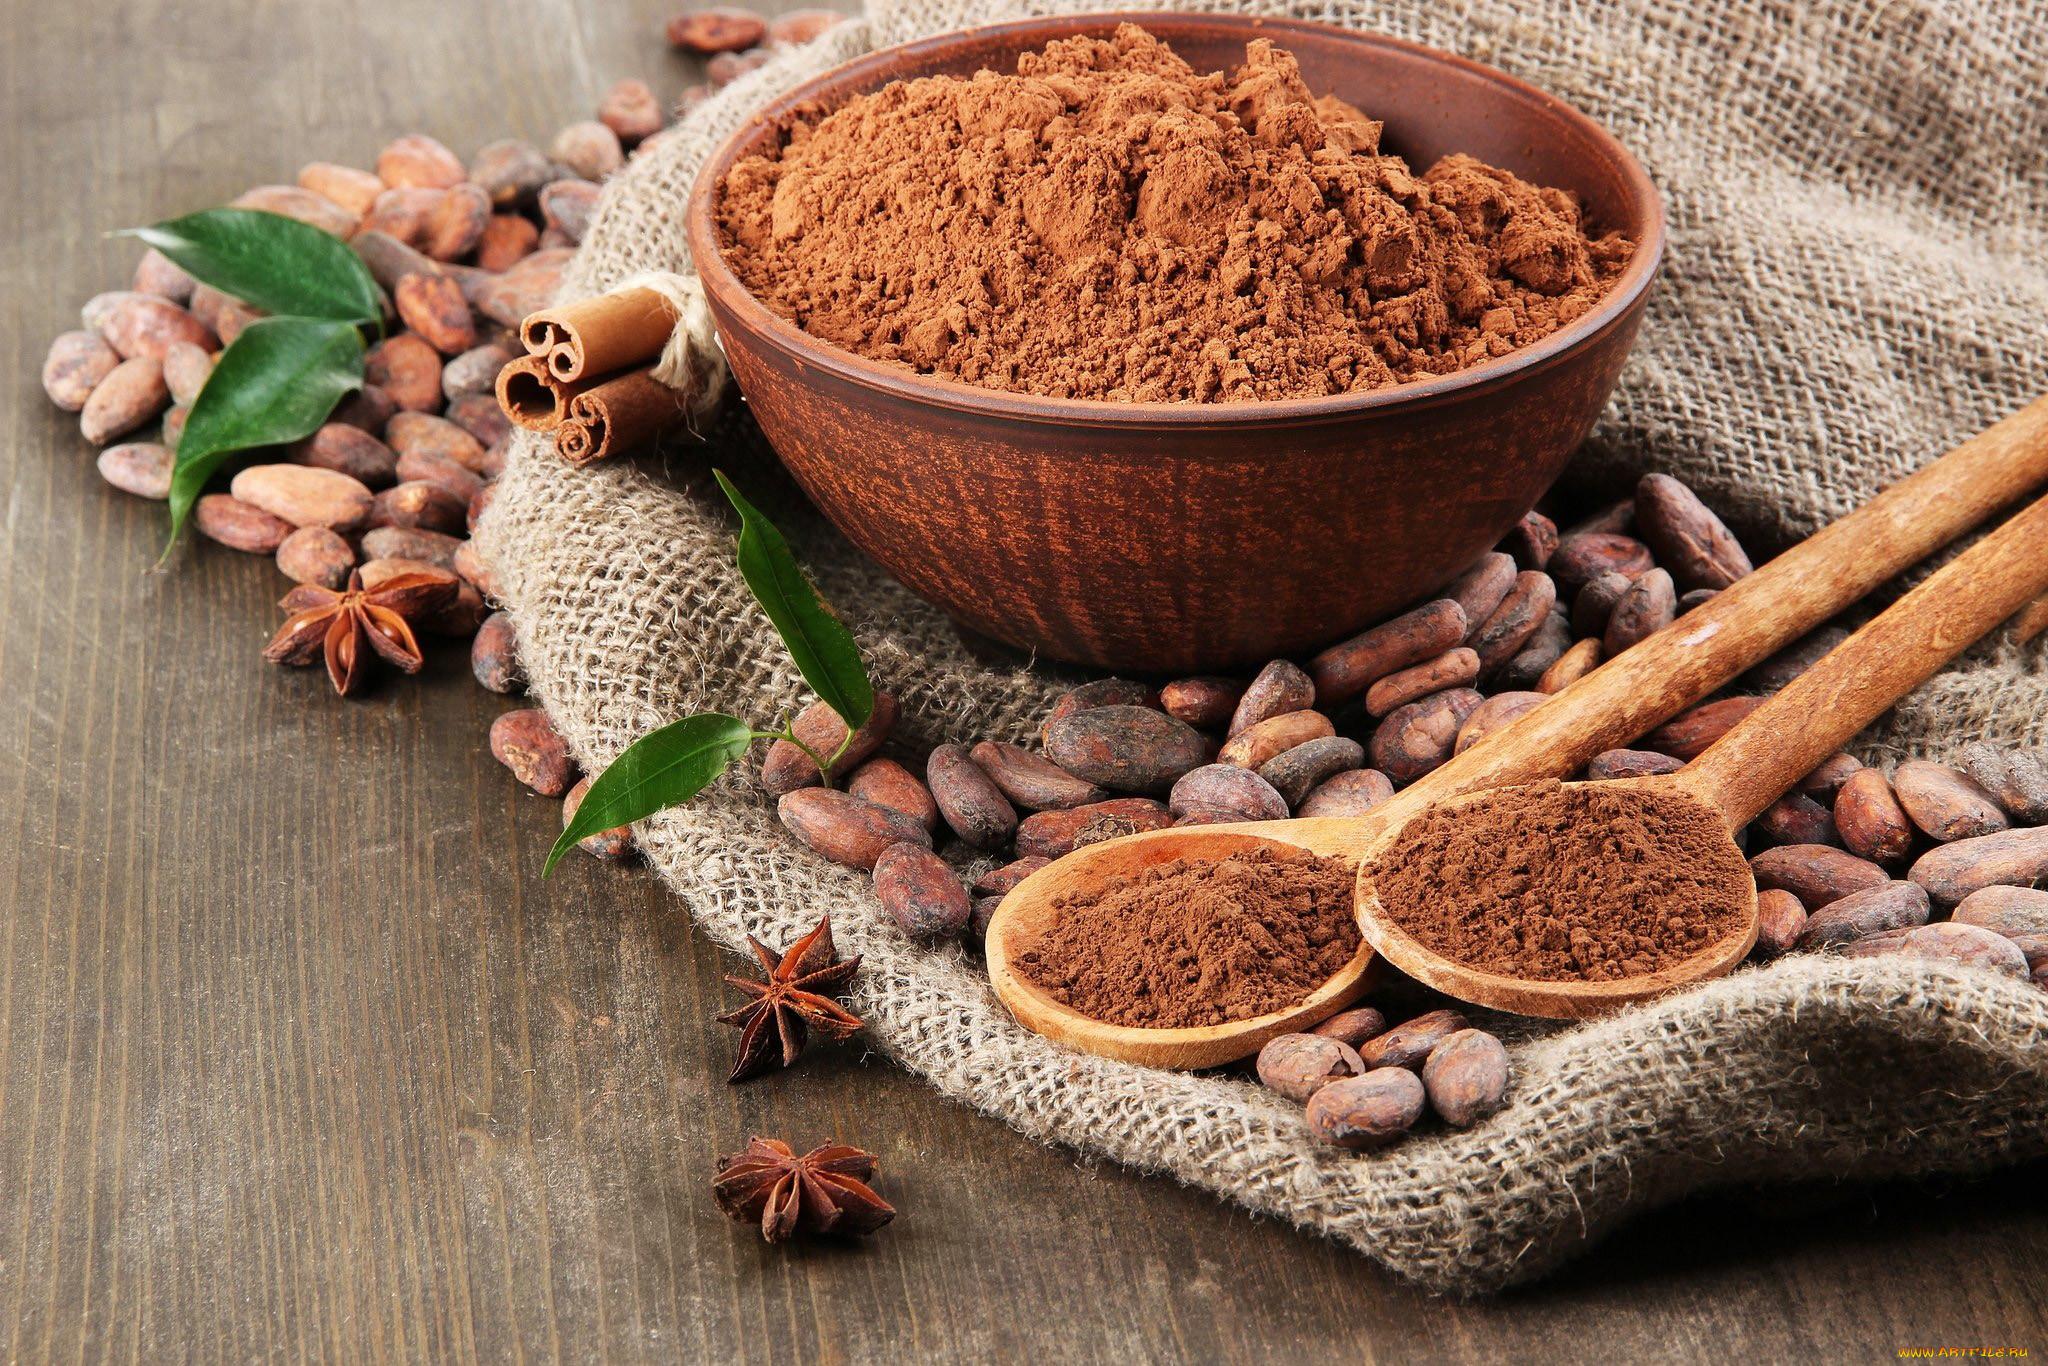 Фото какао в порошке.